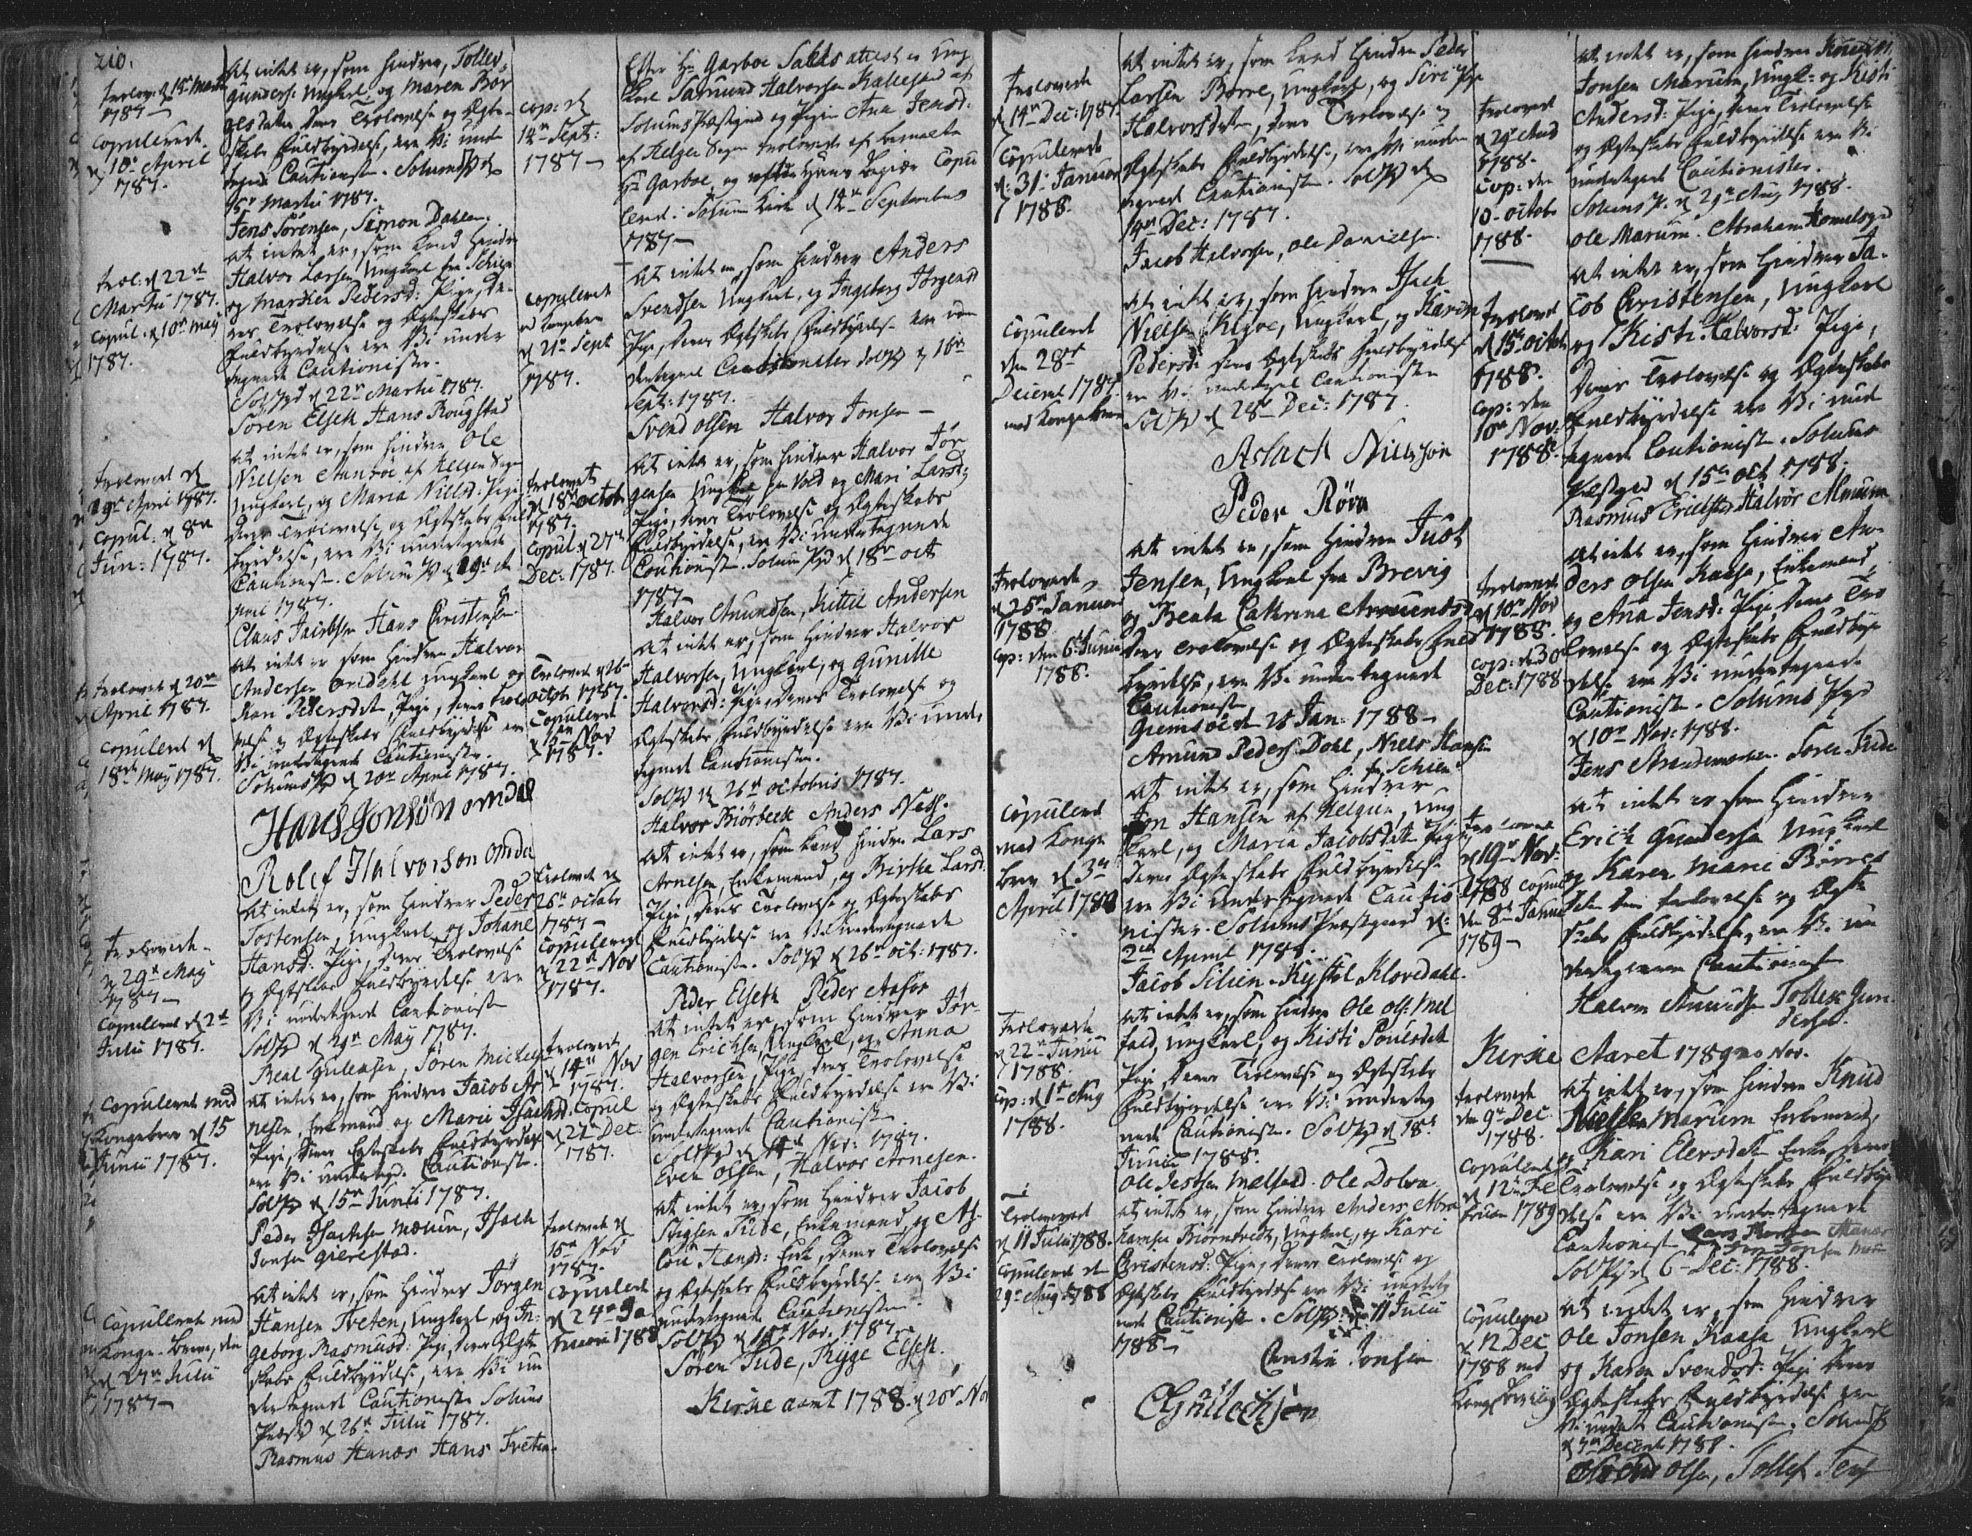 SAKO, Solum kirkebøker, F/Fa/L0003: Ministerialbok nr. I 3, 1761-1814, s. 210-211